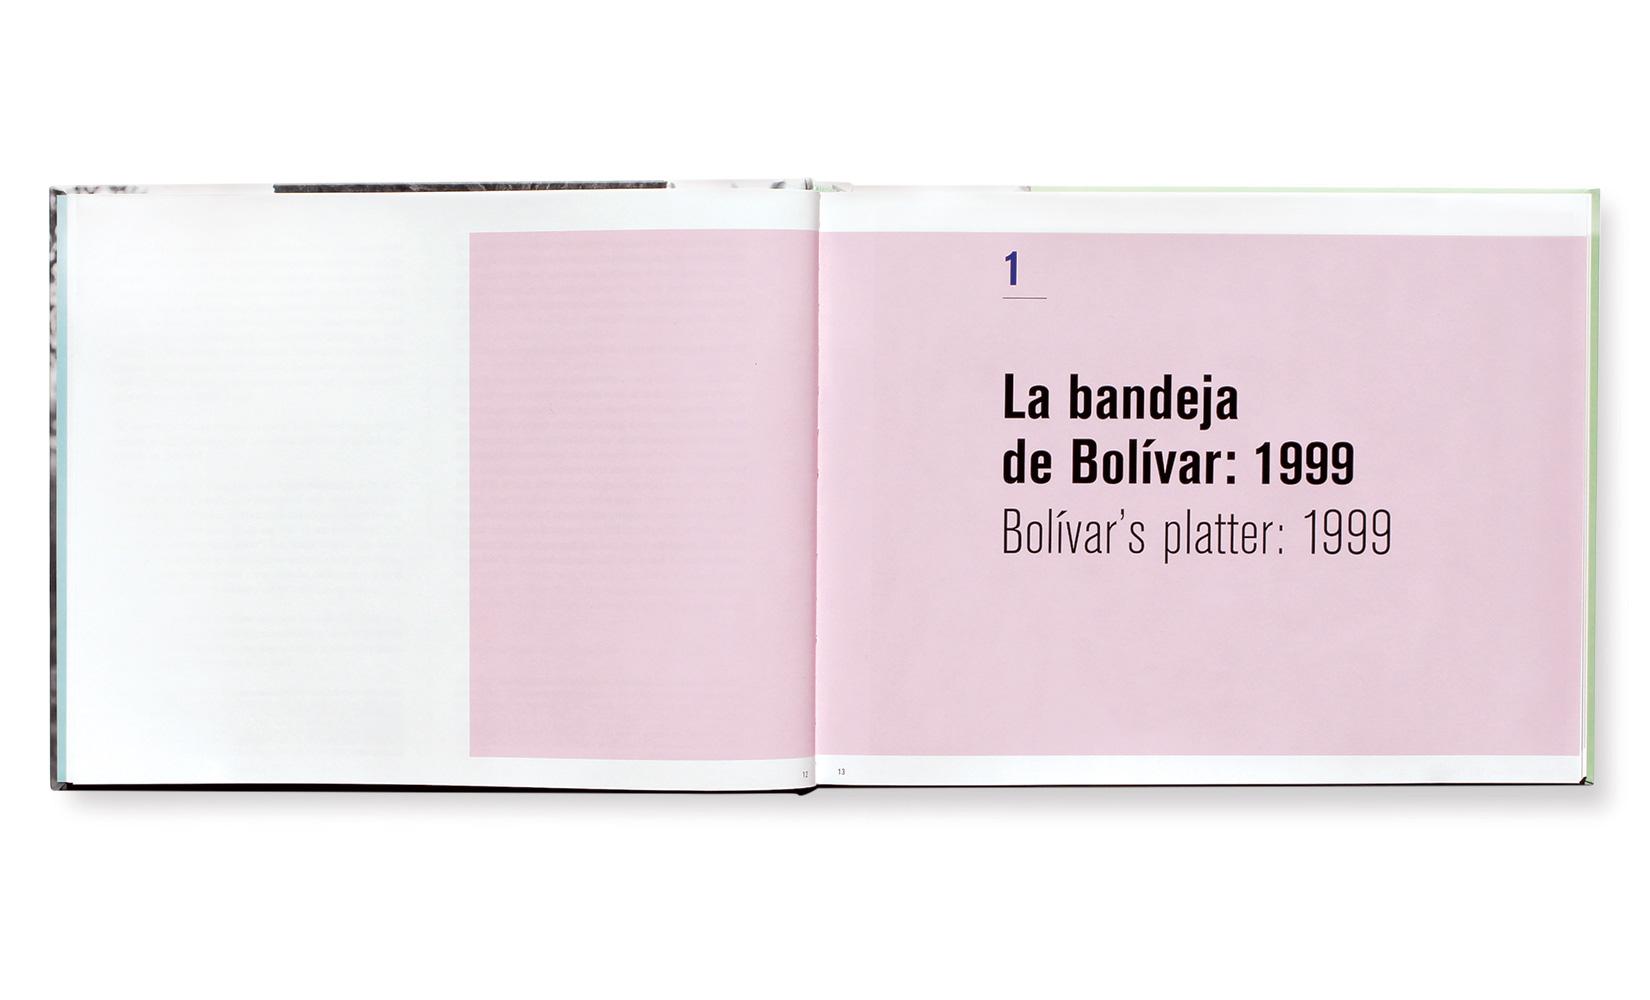 JUAN-MANUEL-ECHAVARRIA-TOLUCA-STUDIO-OLIVIER-ANDREOTTI-02.jpg